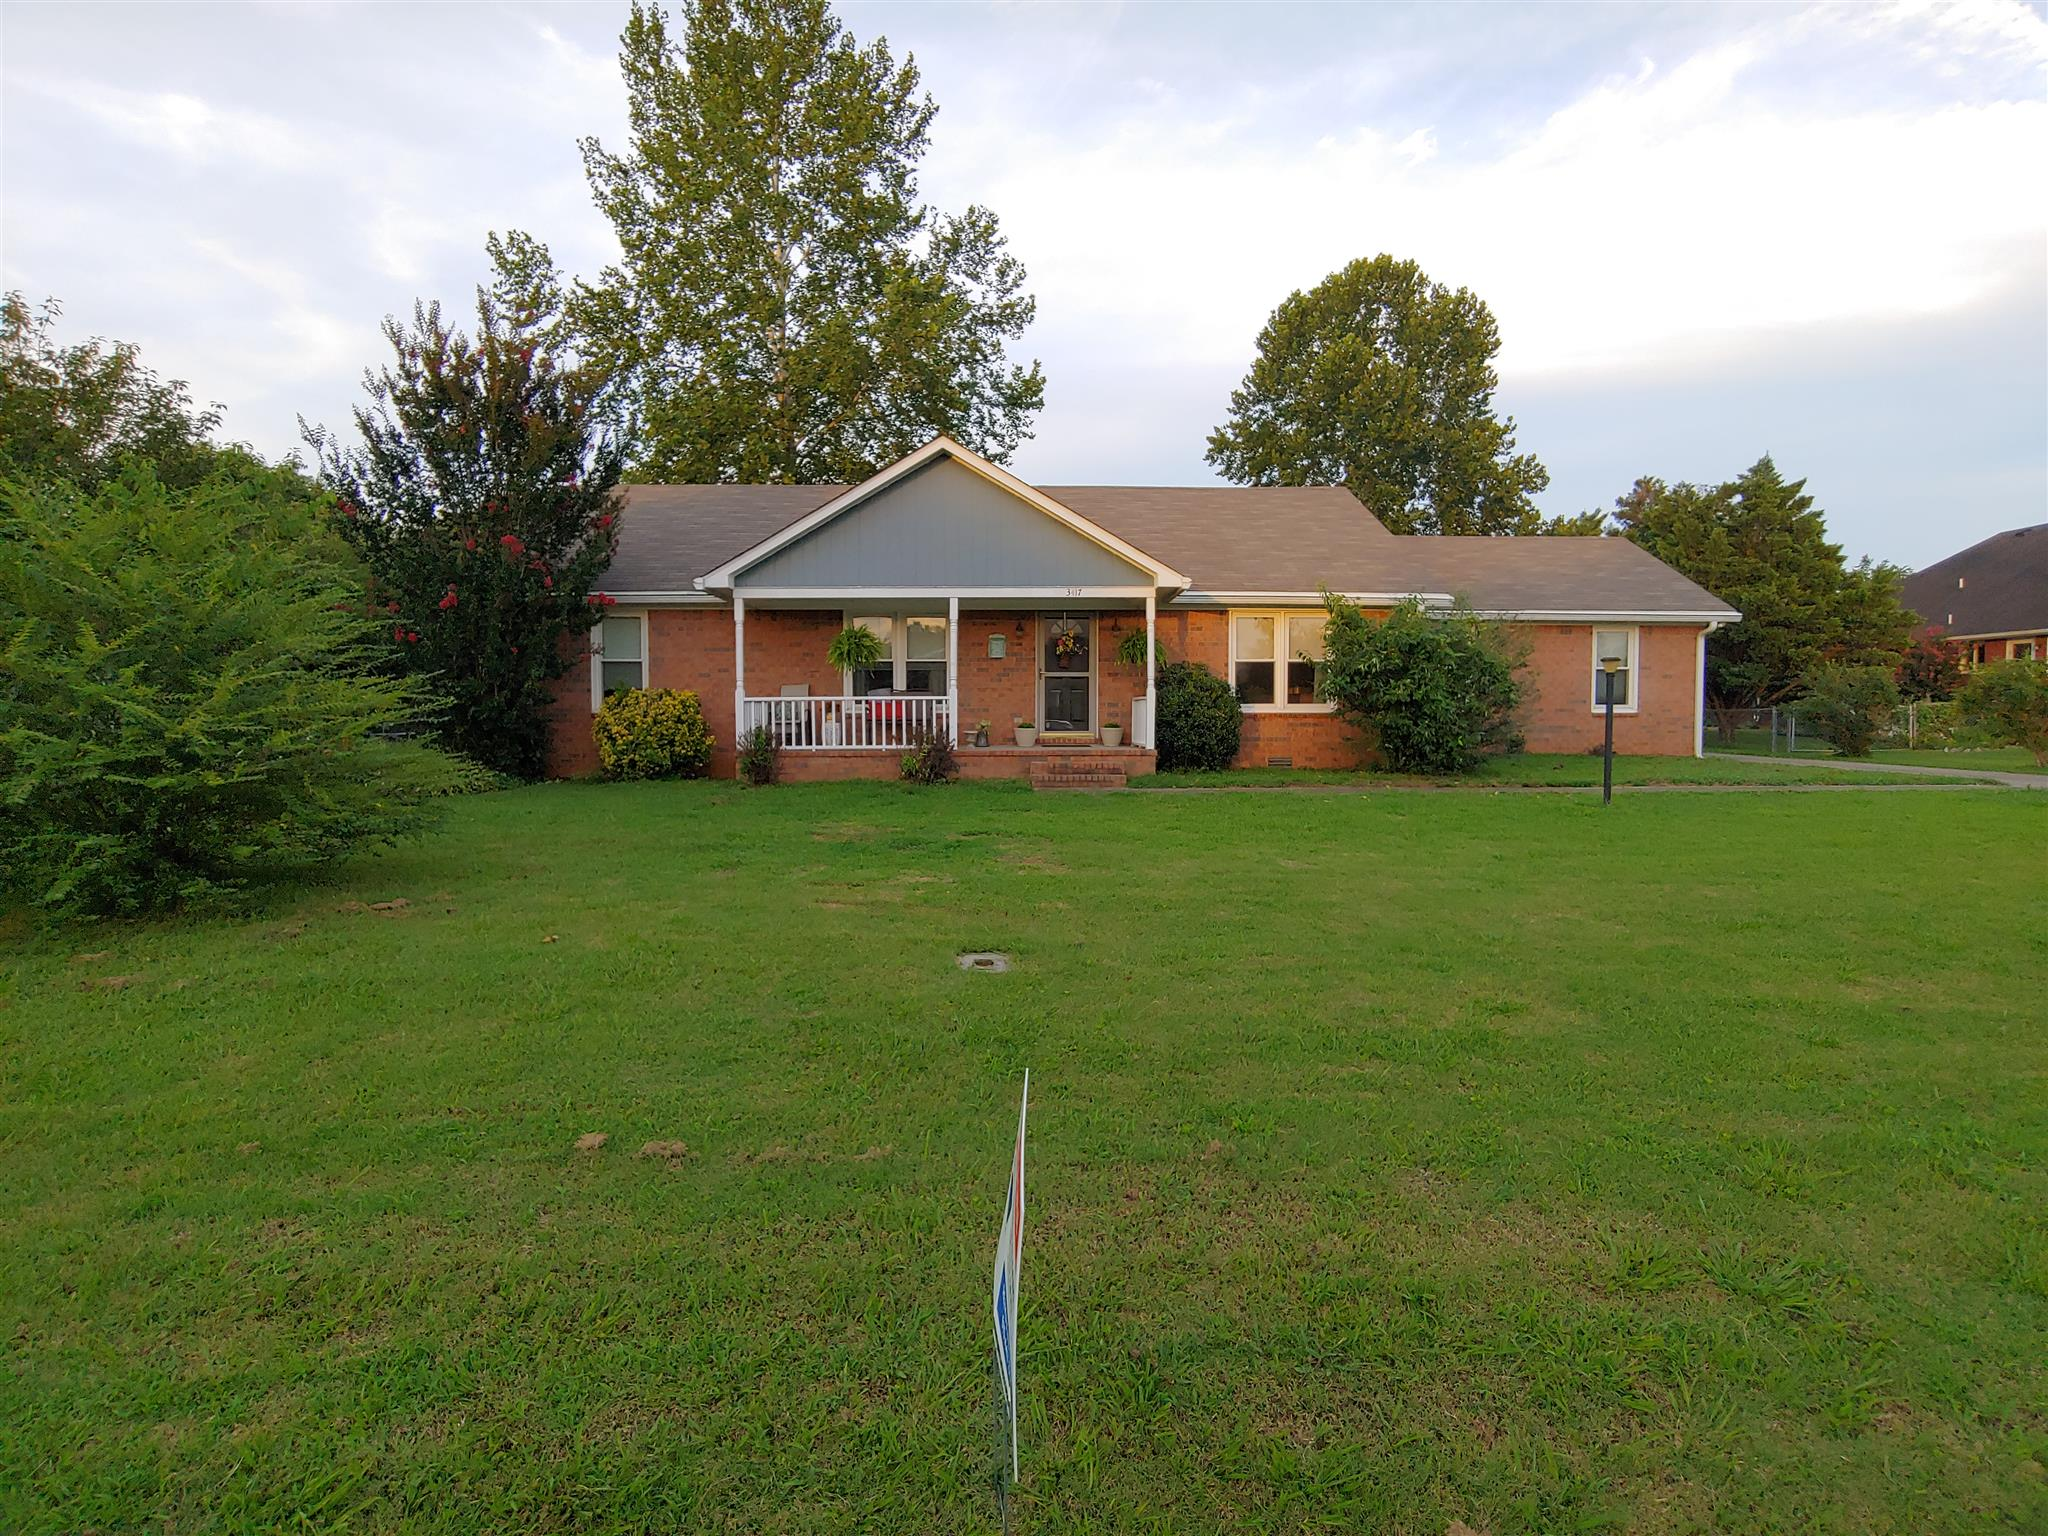 3417 Mary Ave, Murfreesboro, TN 37127 - Murfreesboro, TN real estate listing